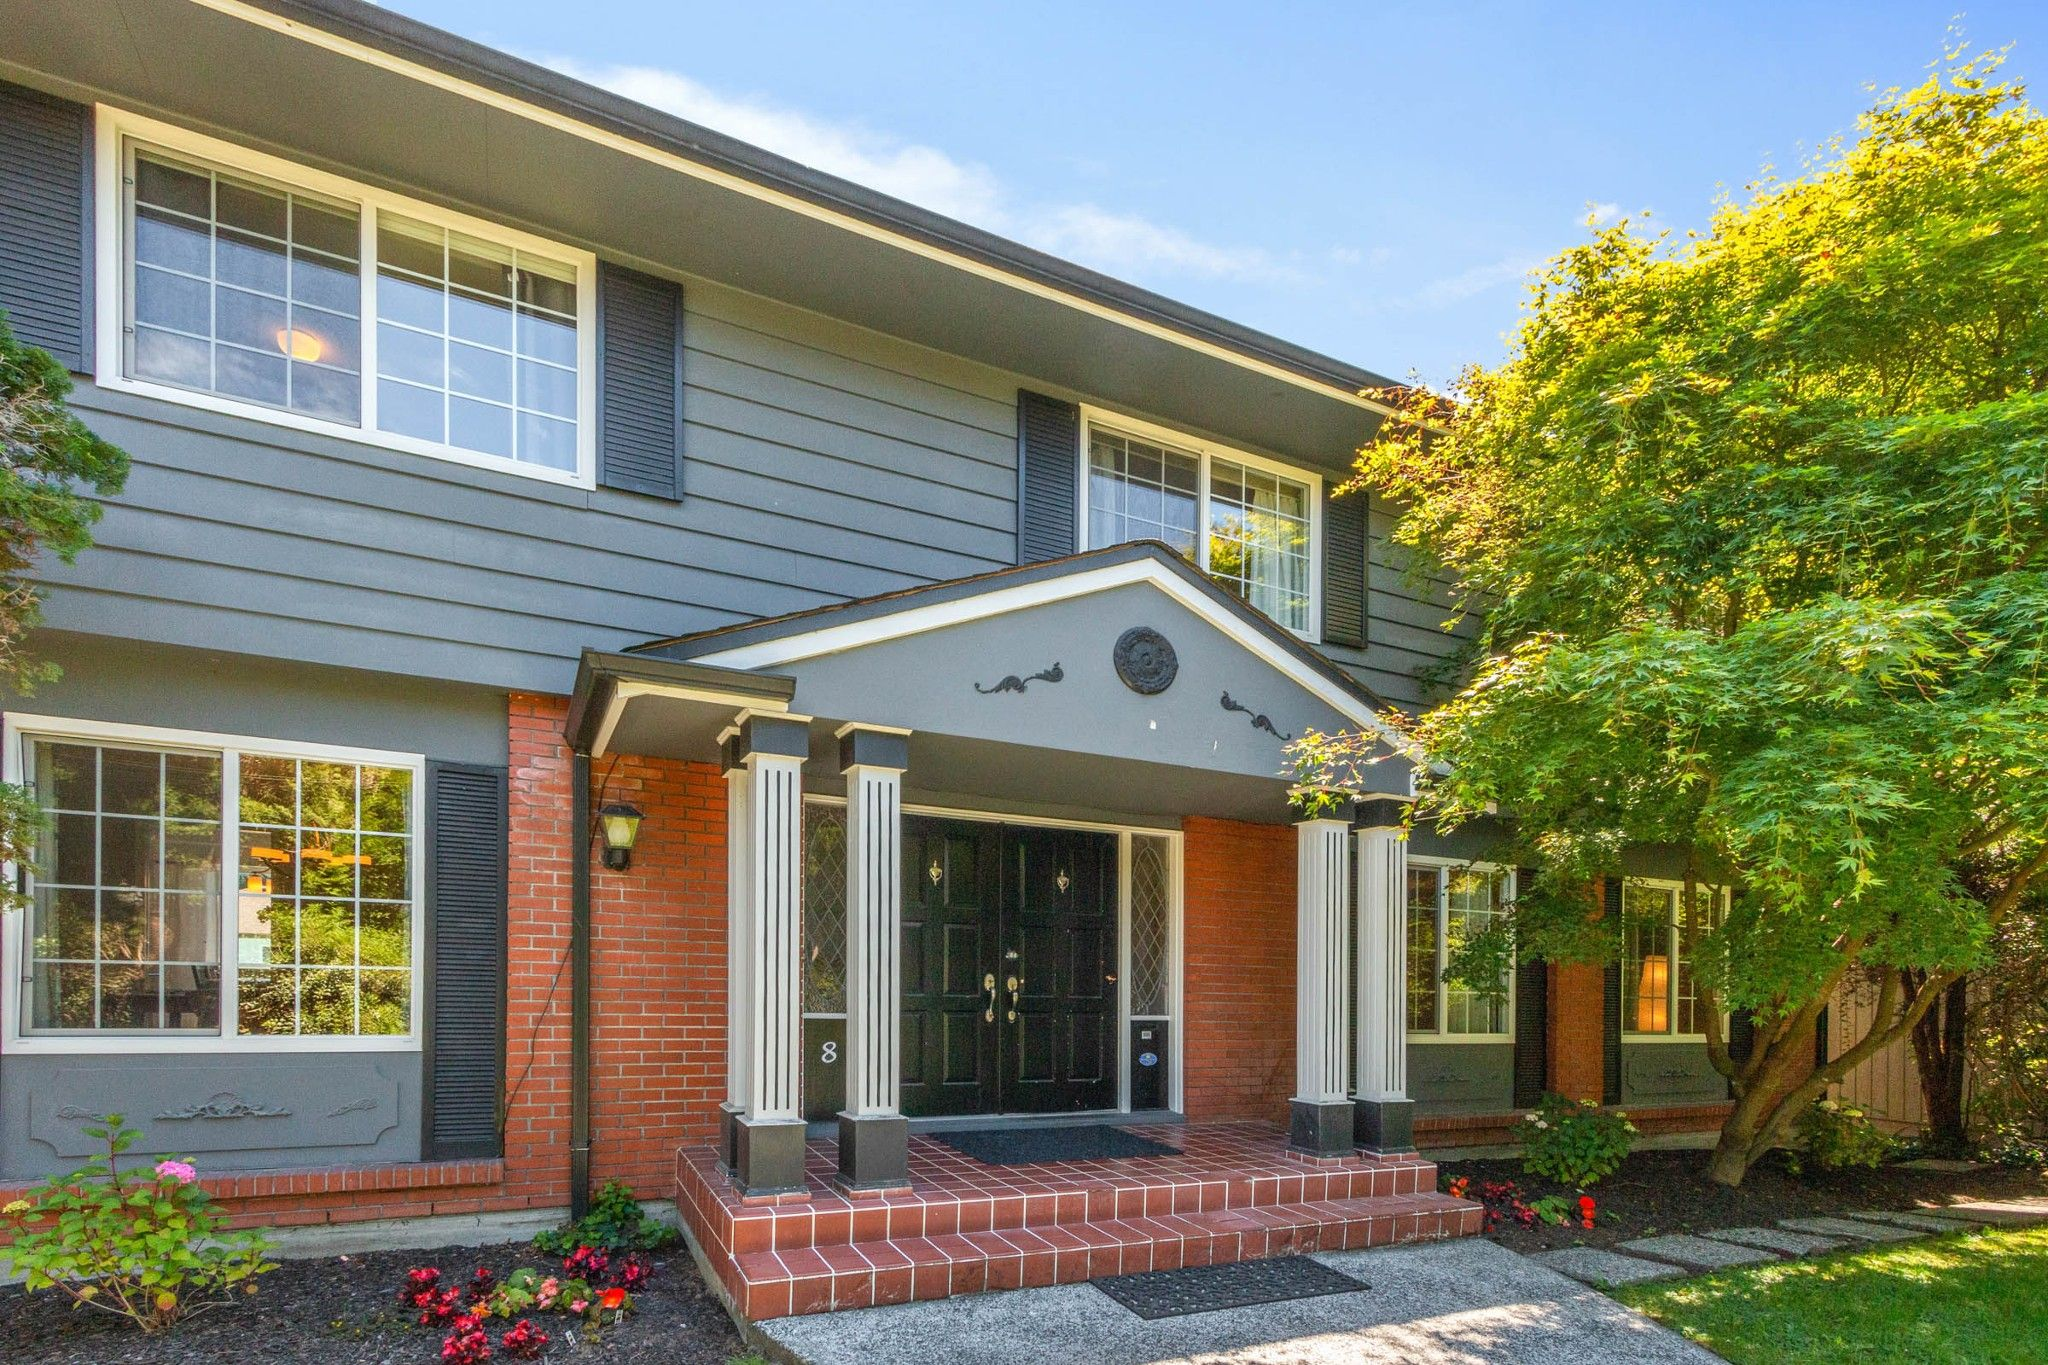 Main Photo: 8 SENNOK Crescent in Vancouver: University VW House for sale (Vancouver West)  : MLS®# R2598524